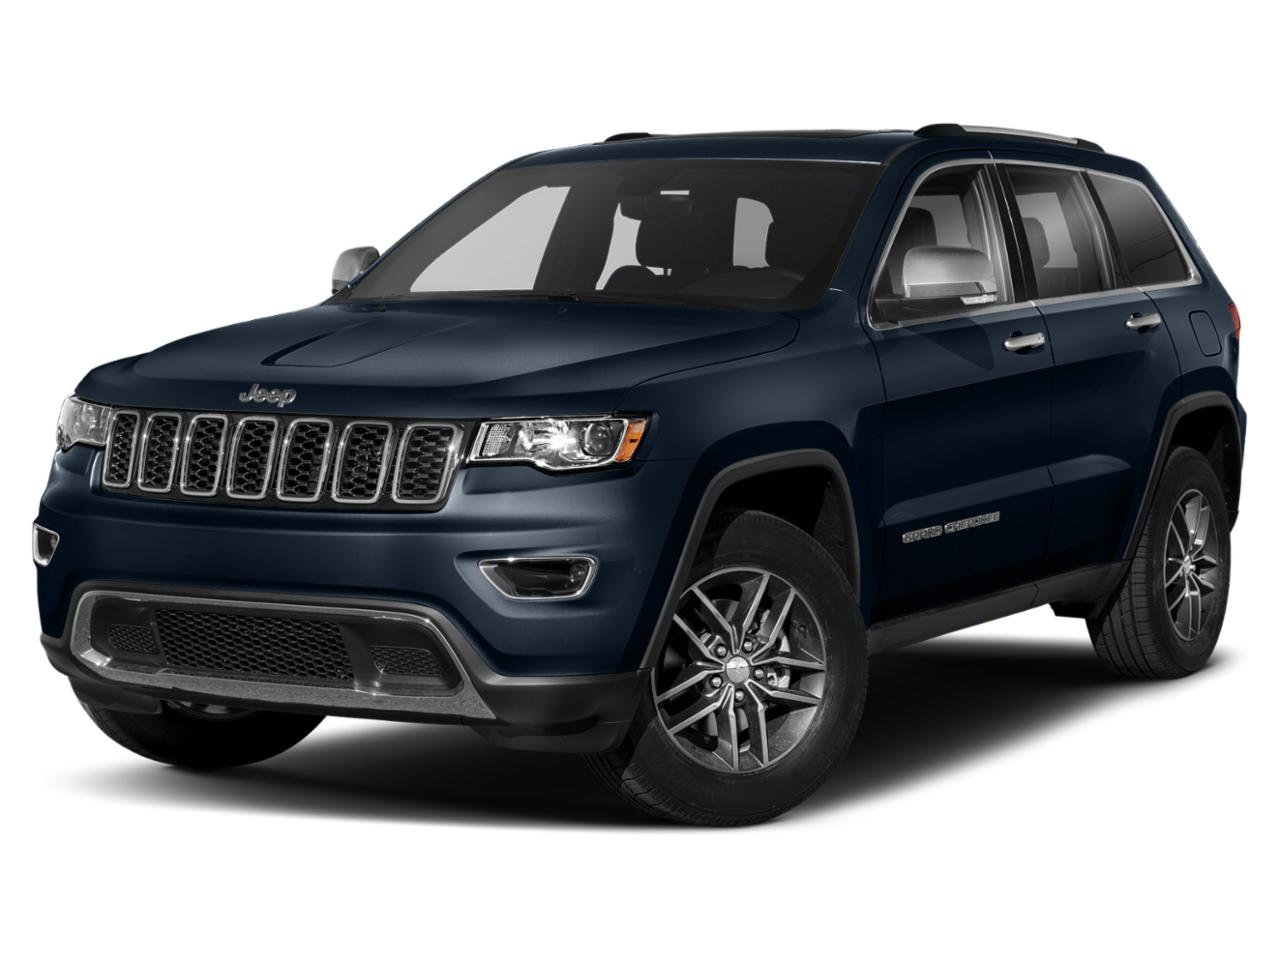 2018 Jeep Grand Cherokee Vehicle Photo in Odessa, TX 79762